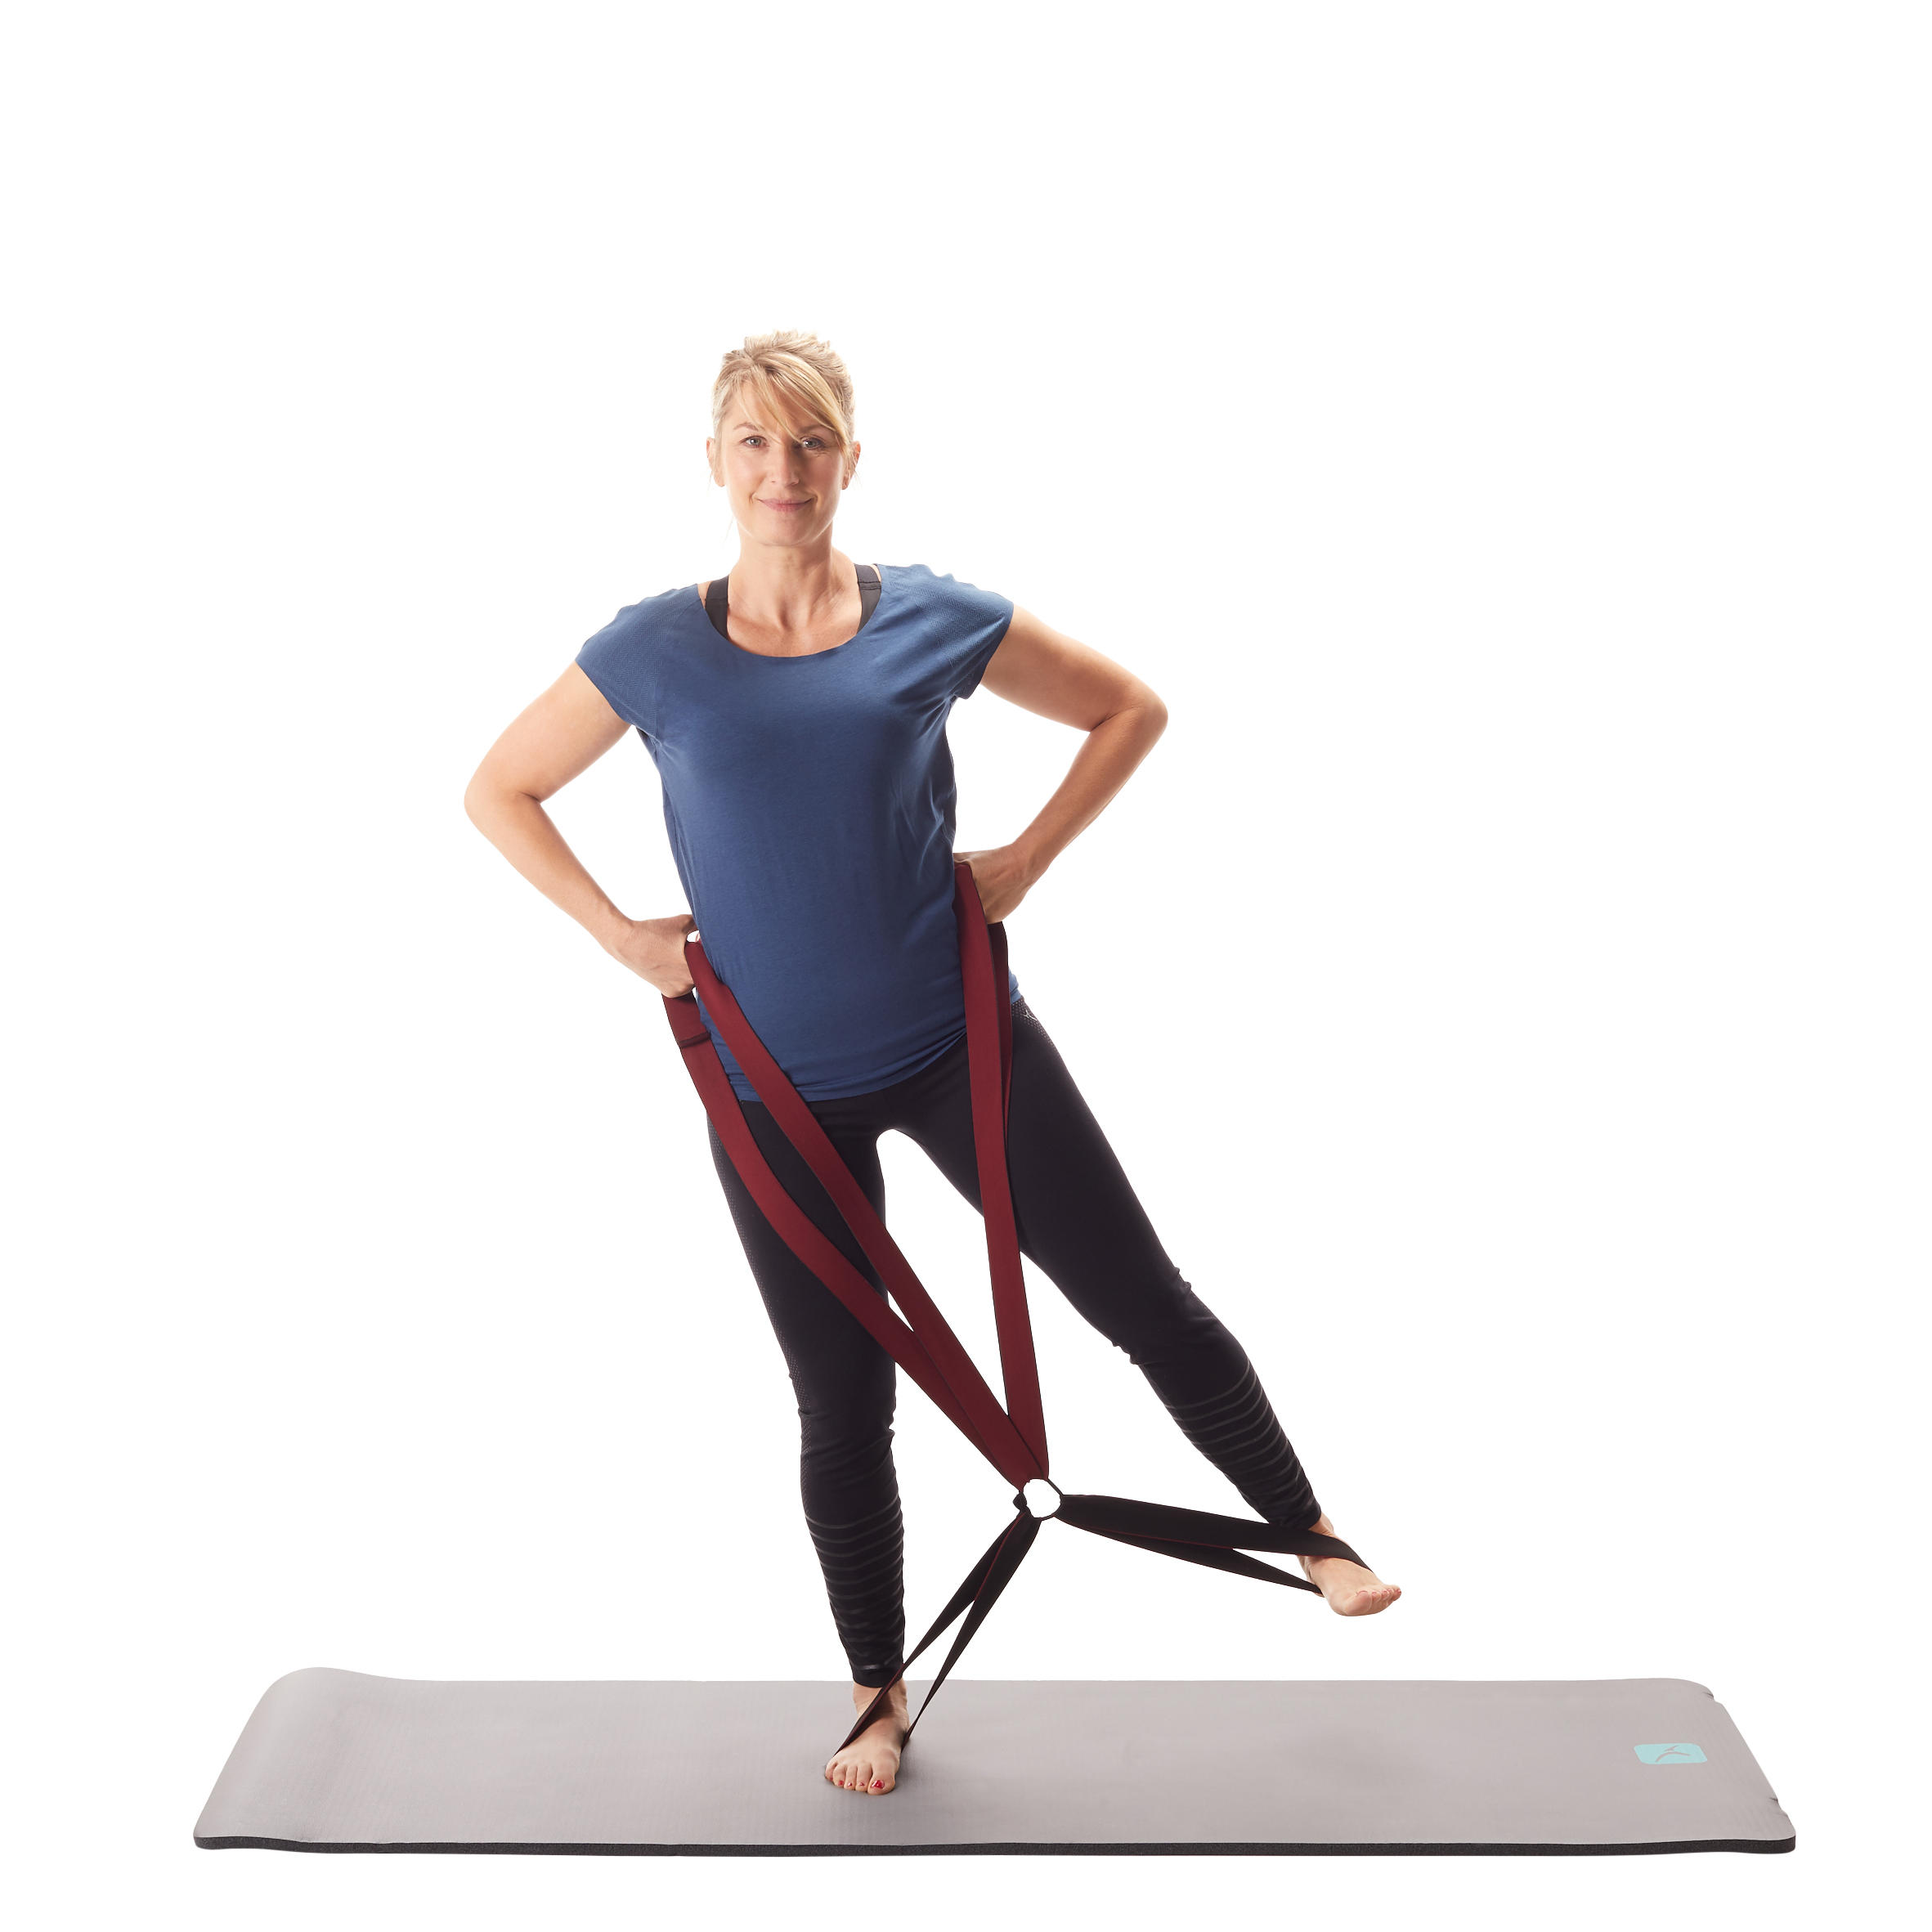 500 Pilates Toning Fabric Elastic Band 4 Loops